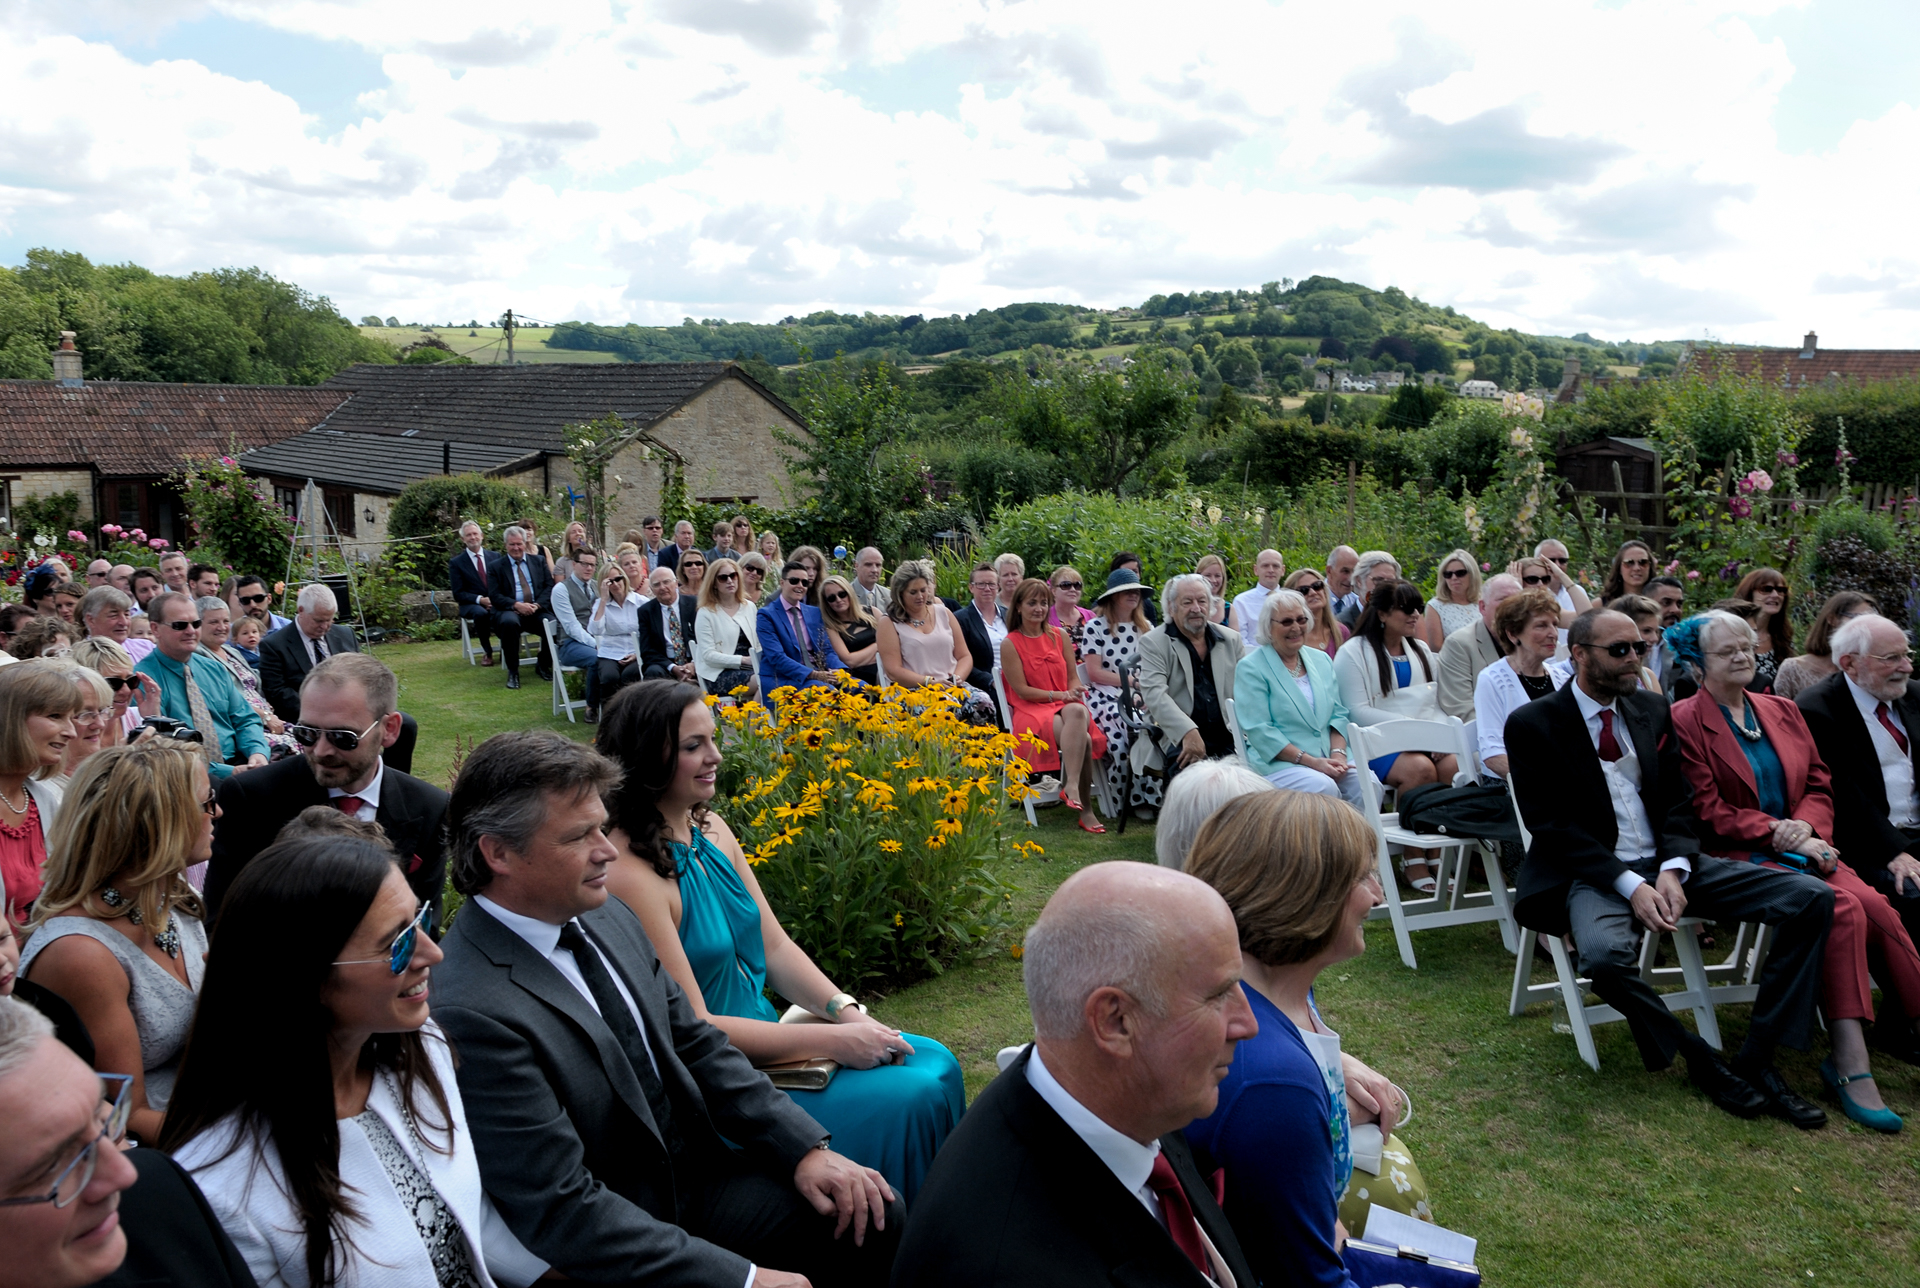 Box-Wiltshire-wedding-photography_009.JPG